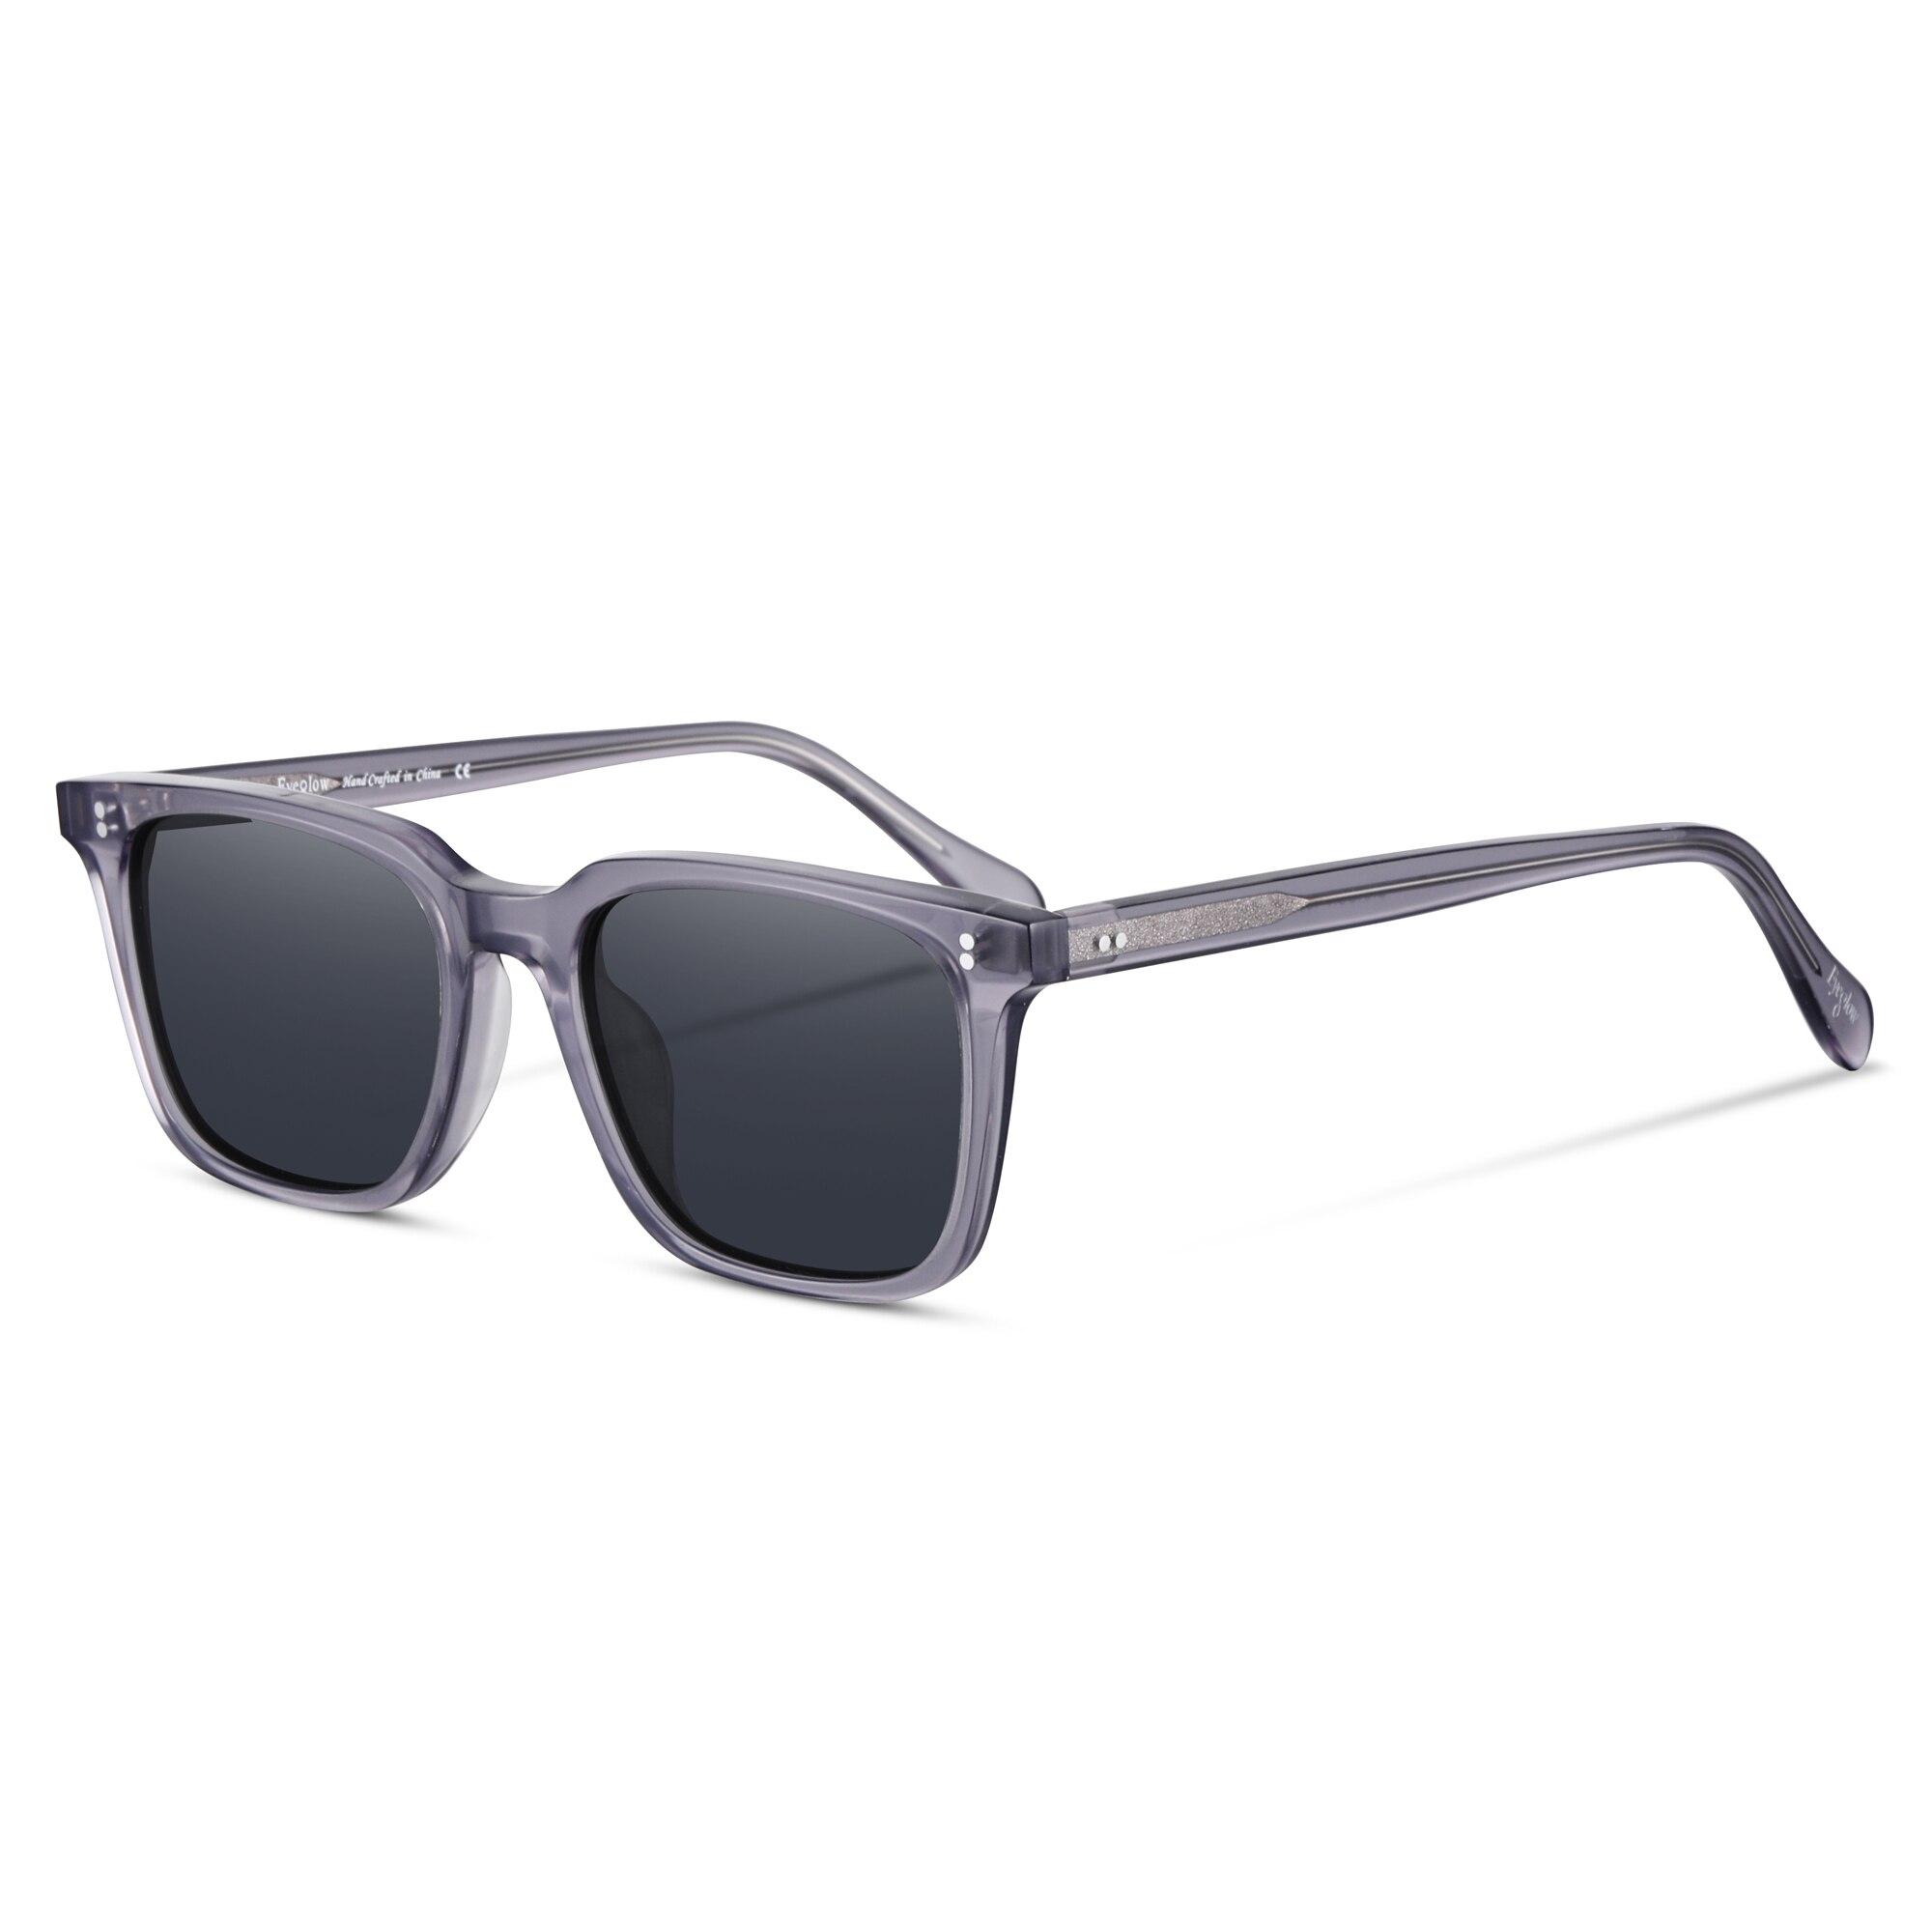 Polarized Sunglasses Women Square Sun Glasses Men Luxury Brand Design Acetate Material